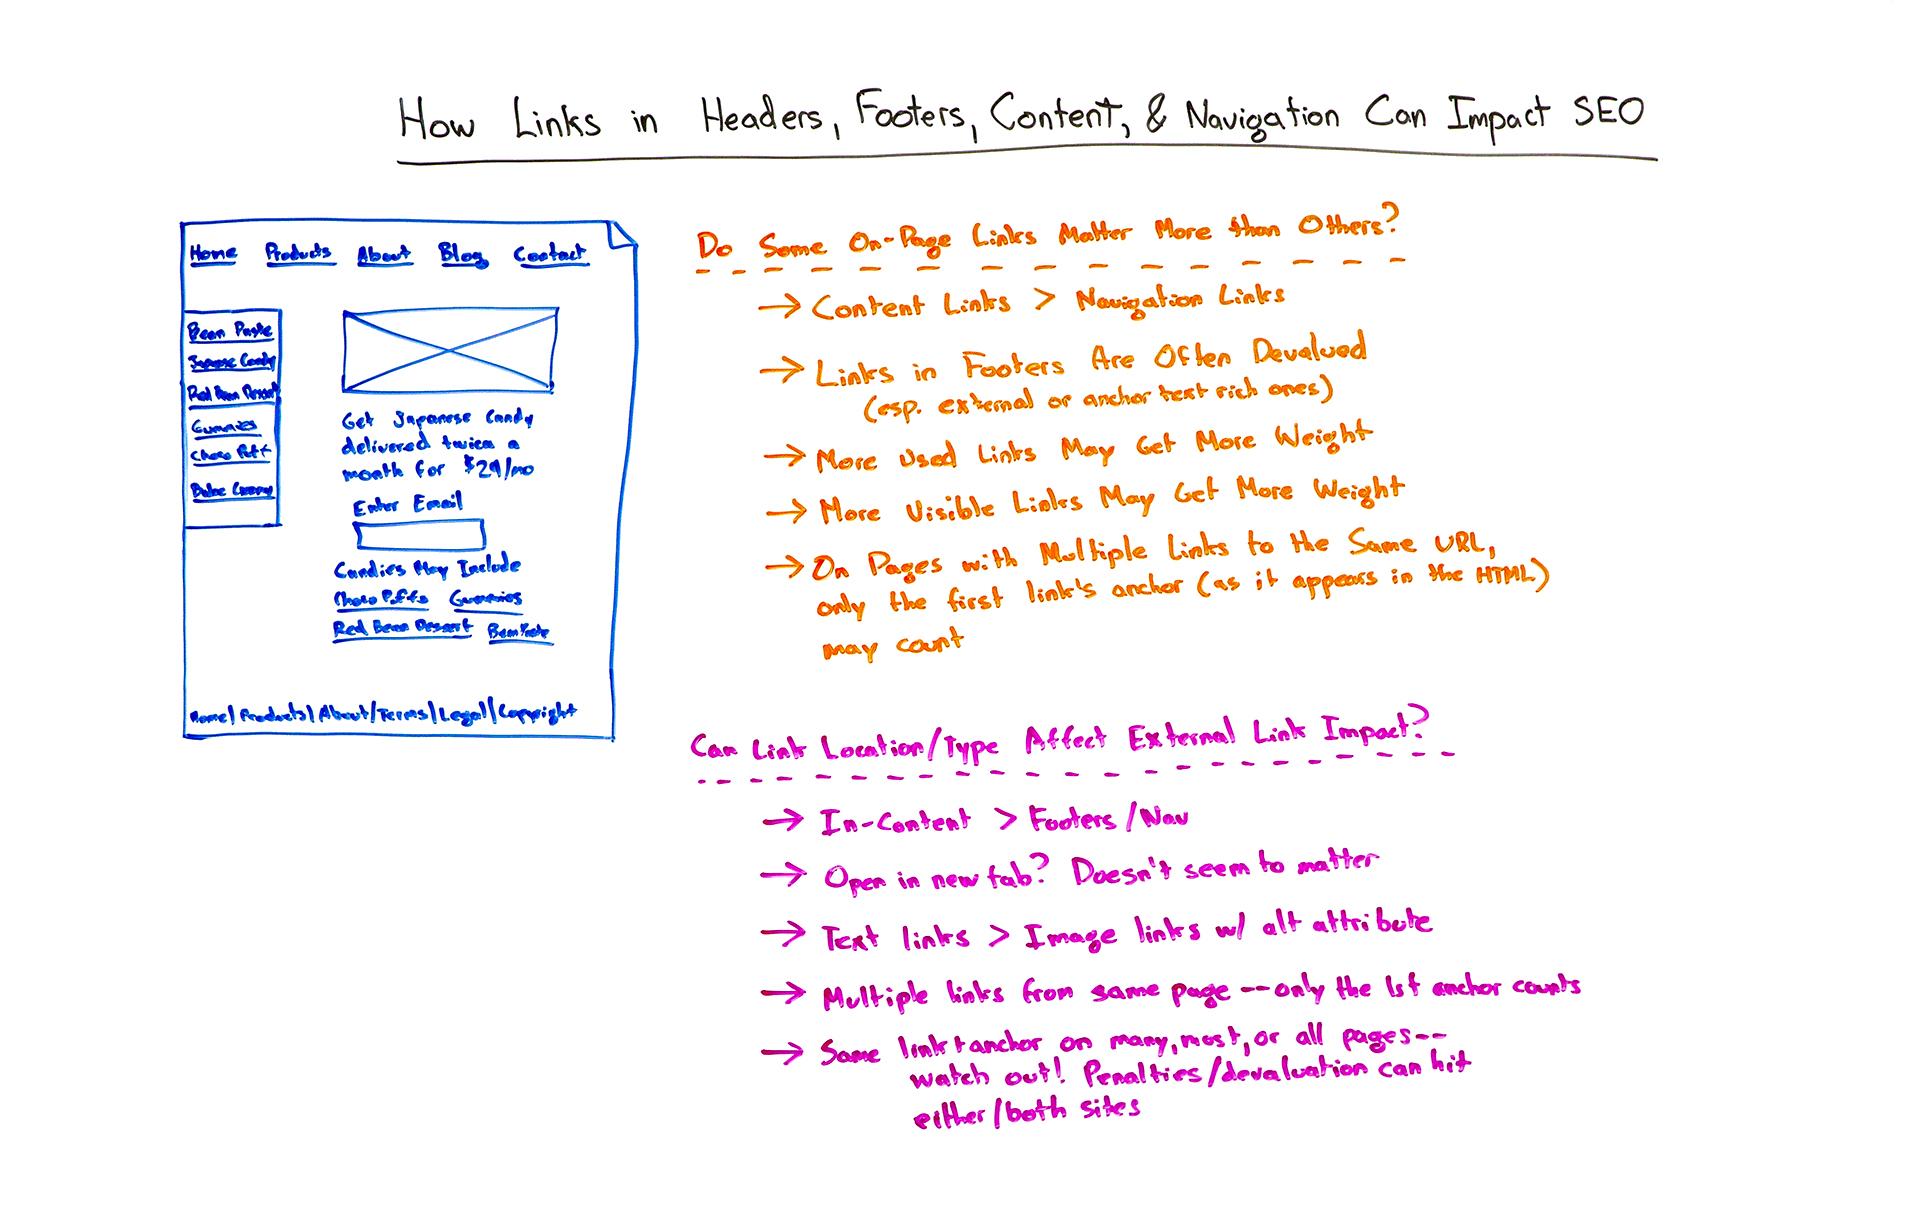 How Links in Headers, Footers, içerik, and Navigation Can Impact SEO